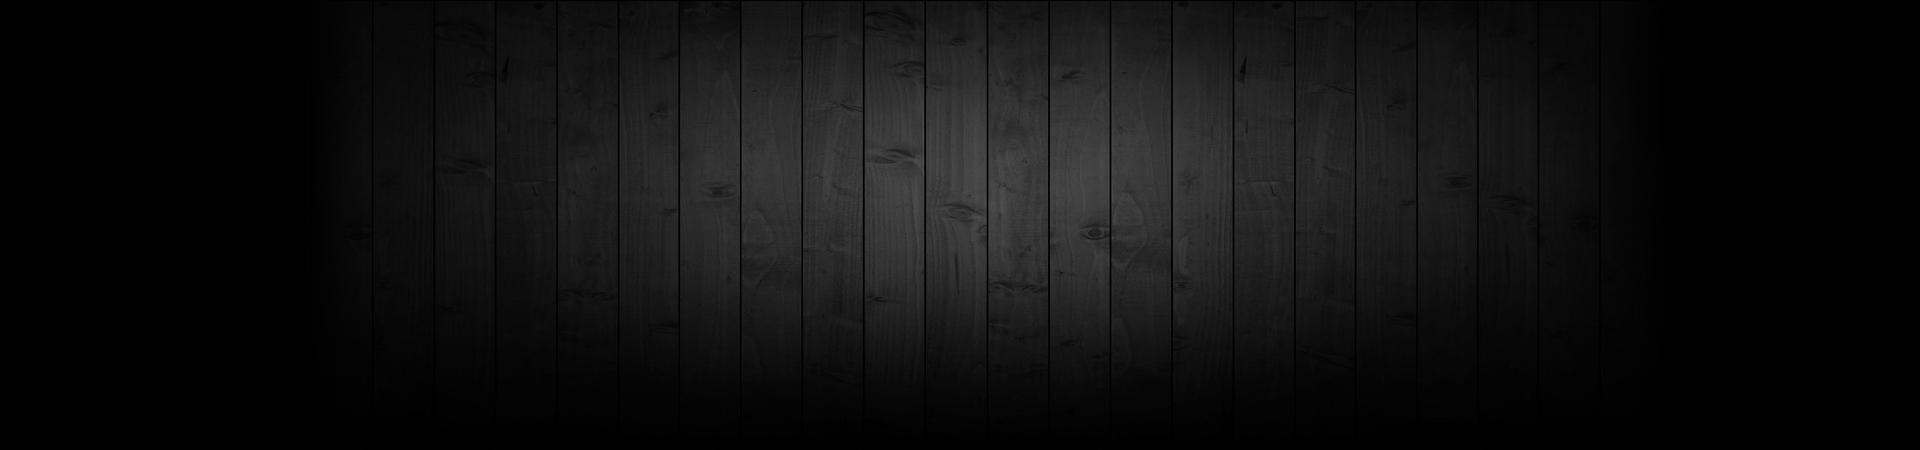 slider-bg-DarkWood